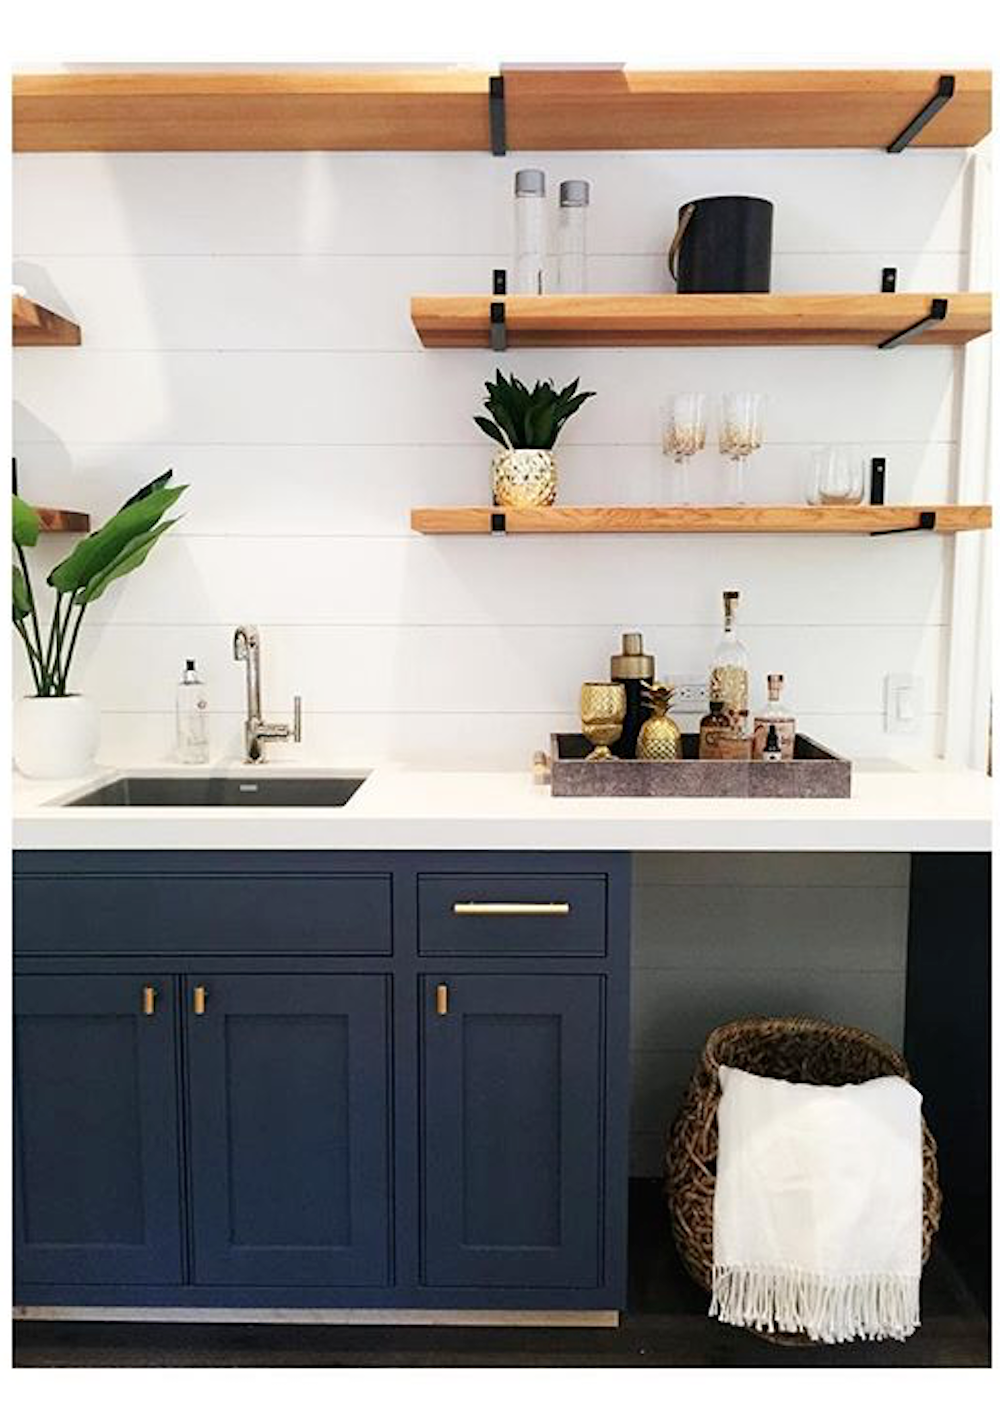 j shelf bracket for floating shelves kitchen design on floating shelves kitchen id=31455